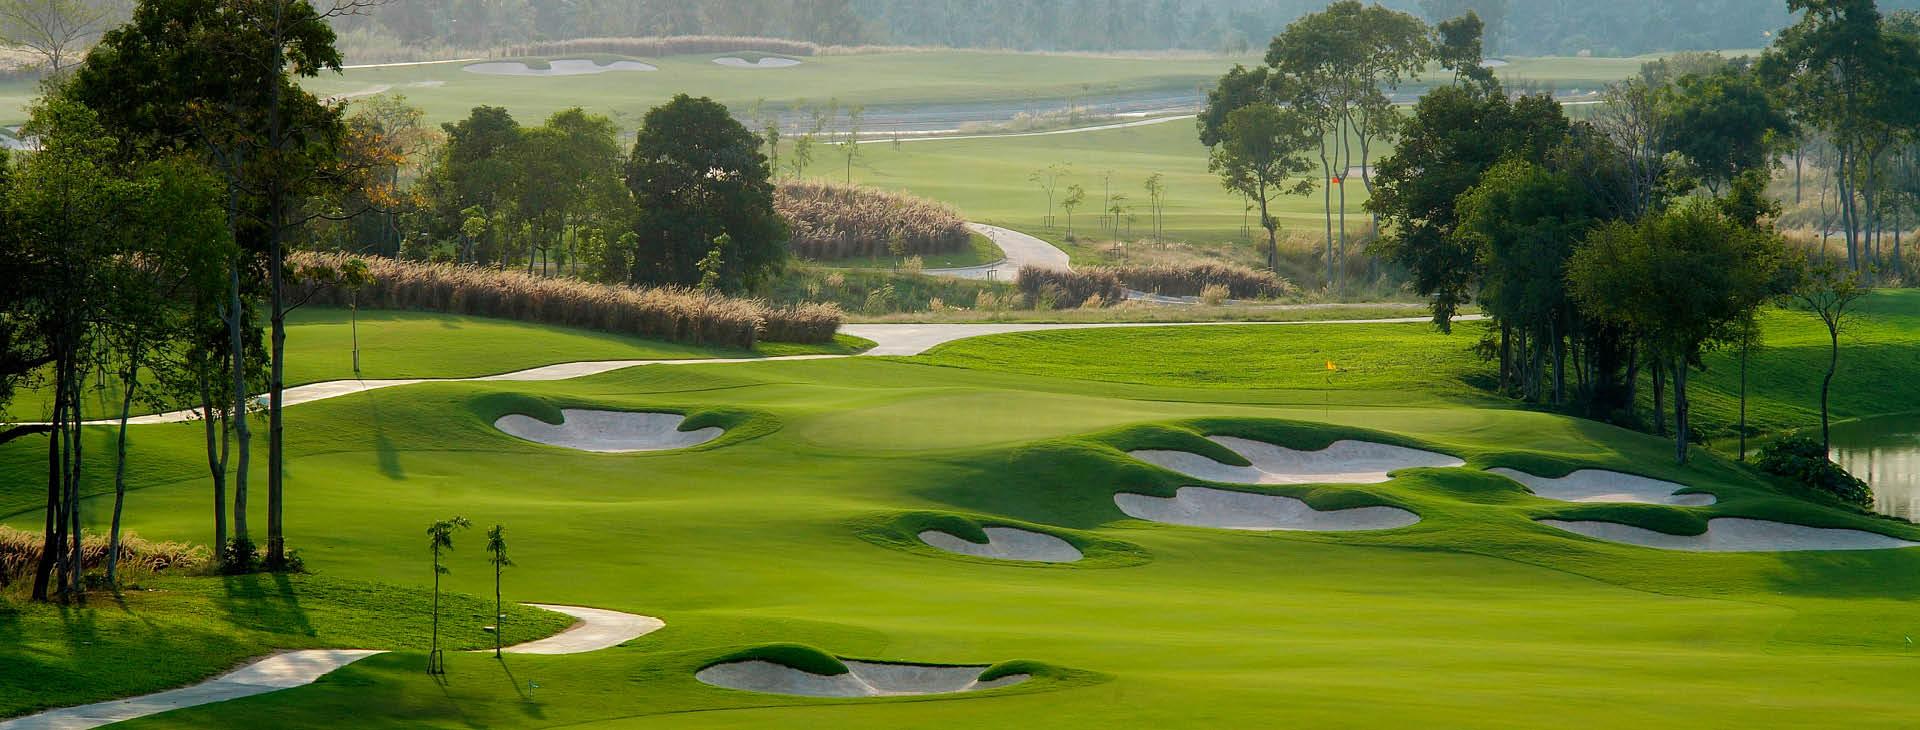 about-us-golf-slider4